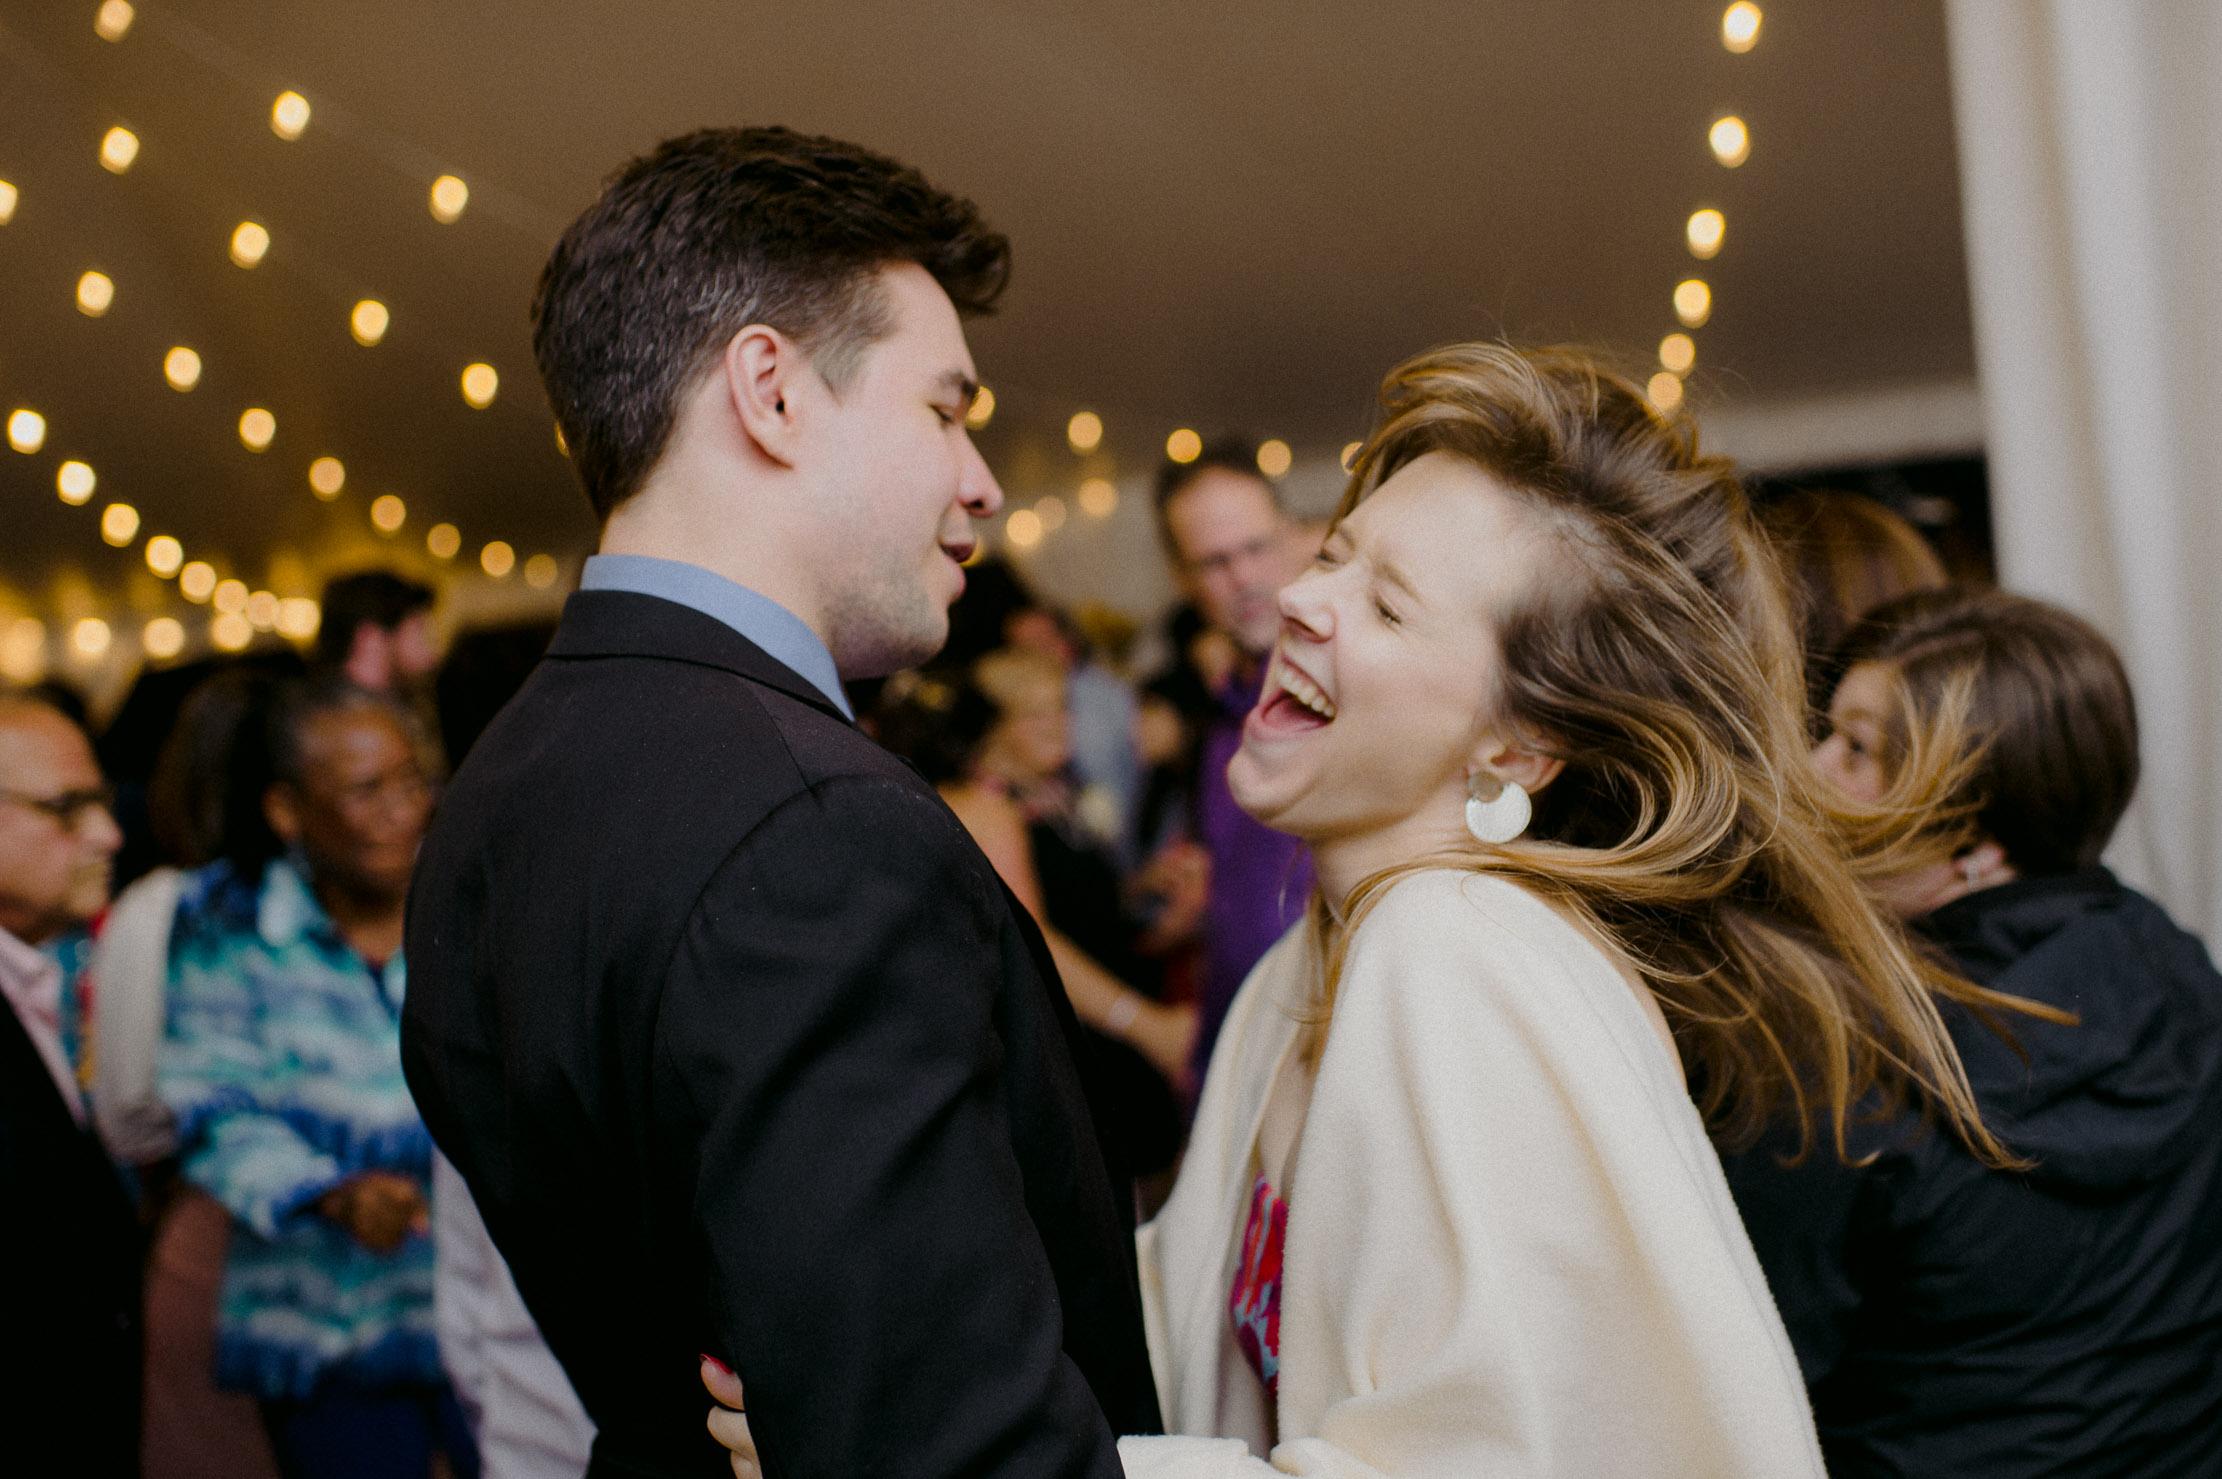 Wings-Castle-Millbrook-NY-Upstate-Wedding-Photographer-1168.jpg